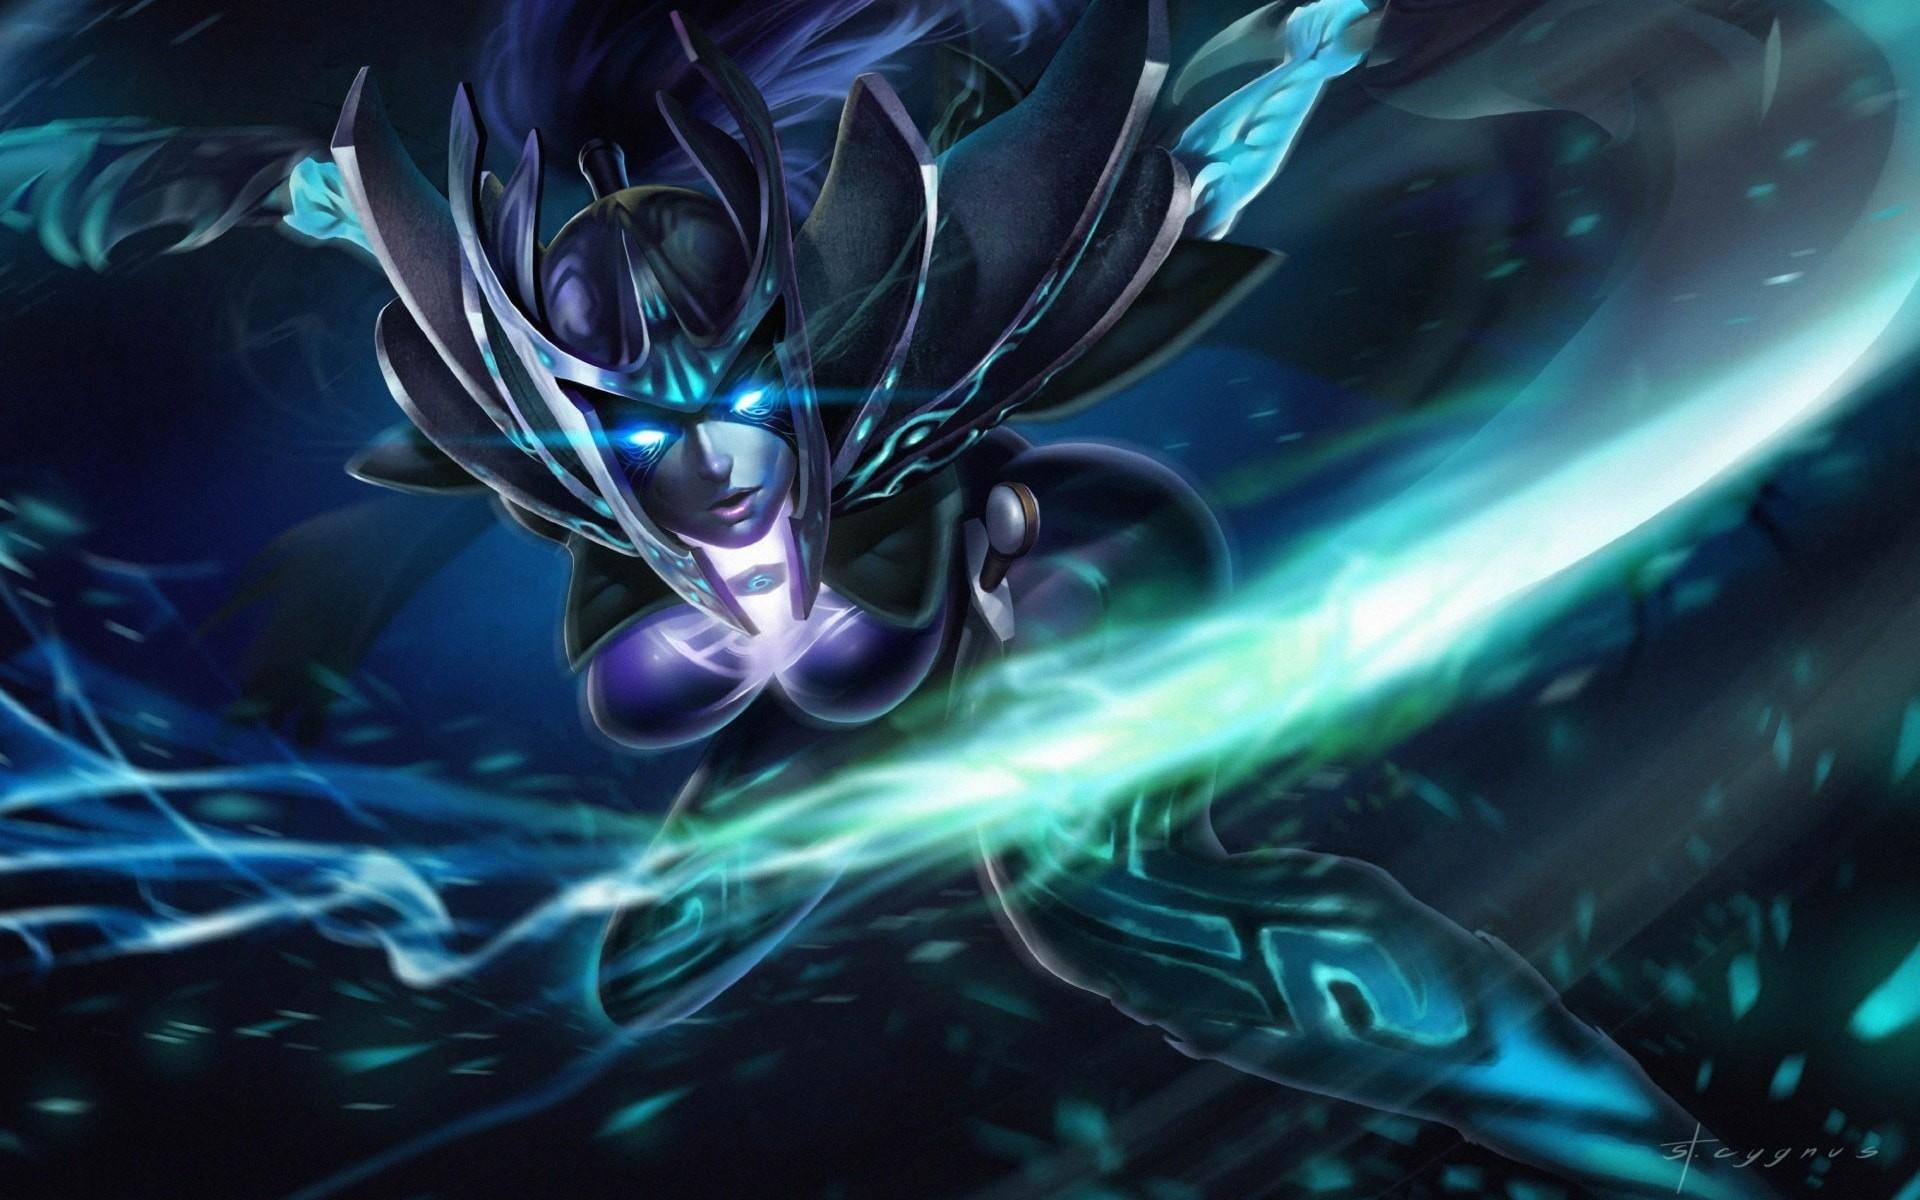 Dota2 : Phantom Assassin Background Dota2 : Phantom Assassin HD pics